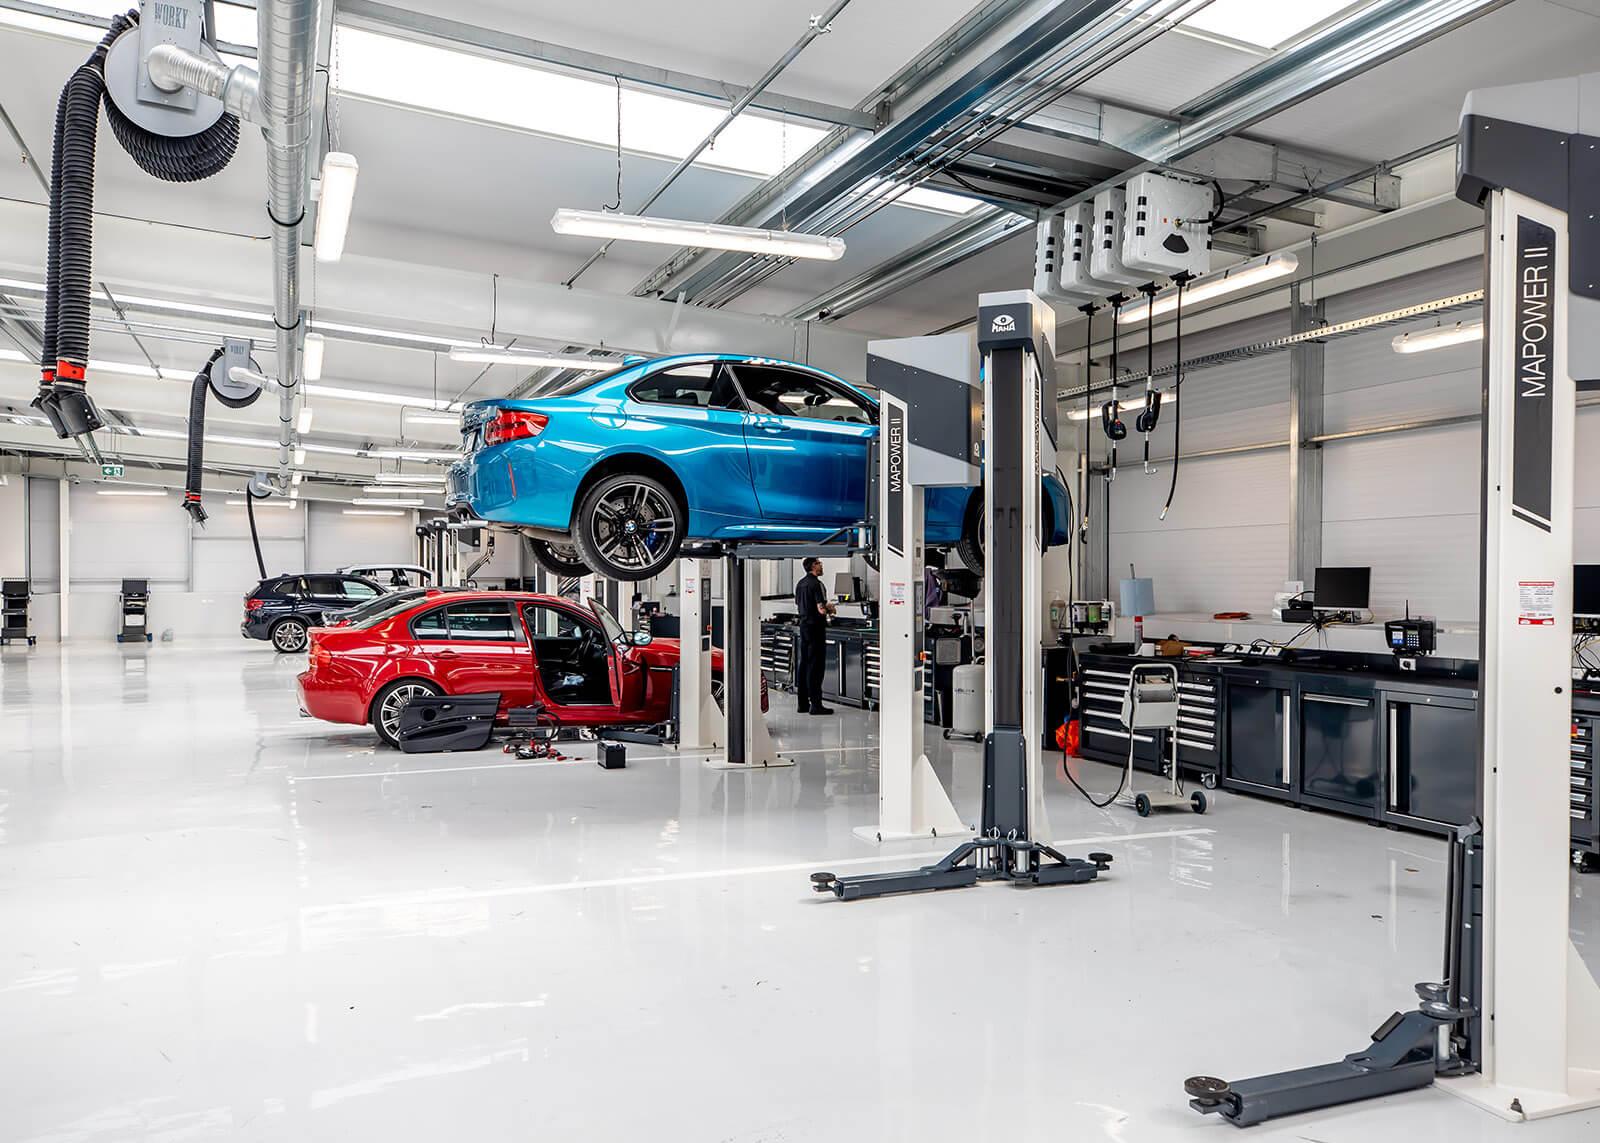 Servicing BMW vehicles